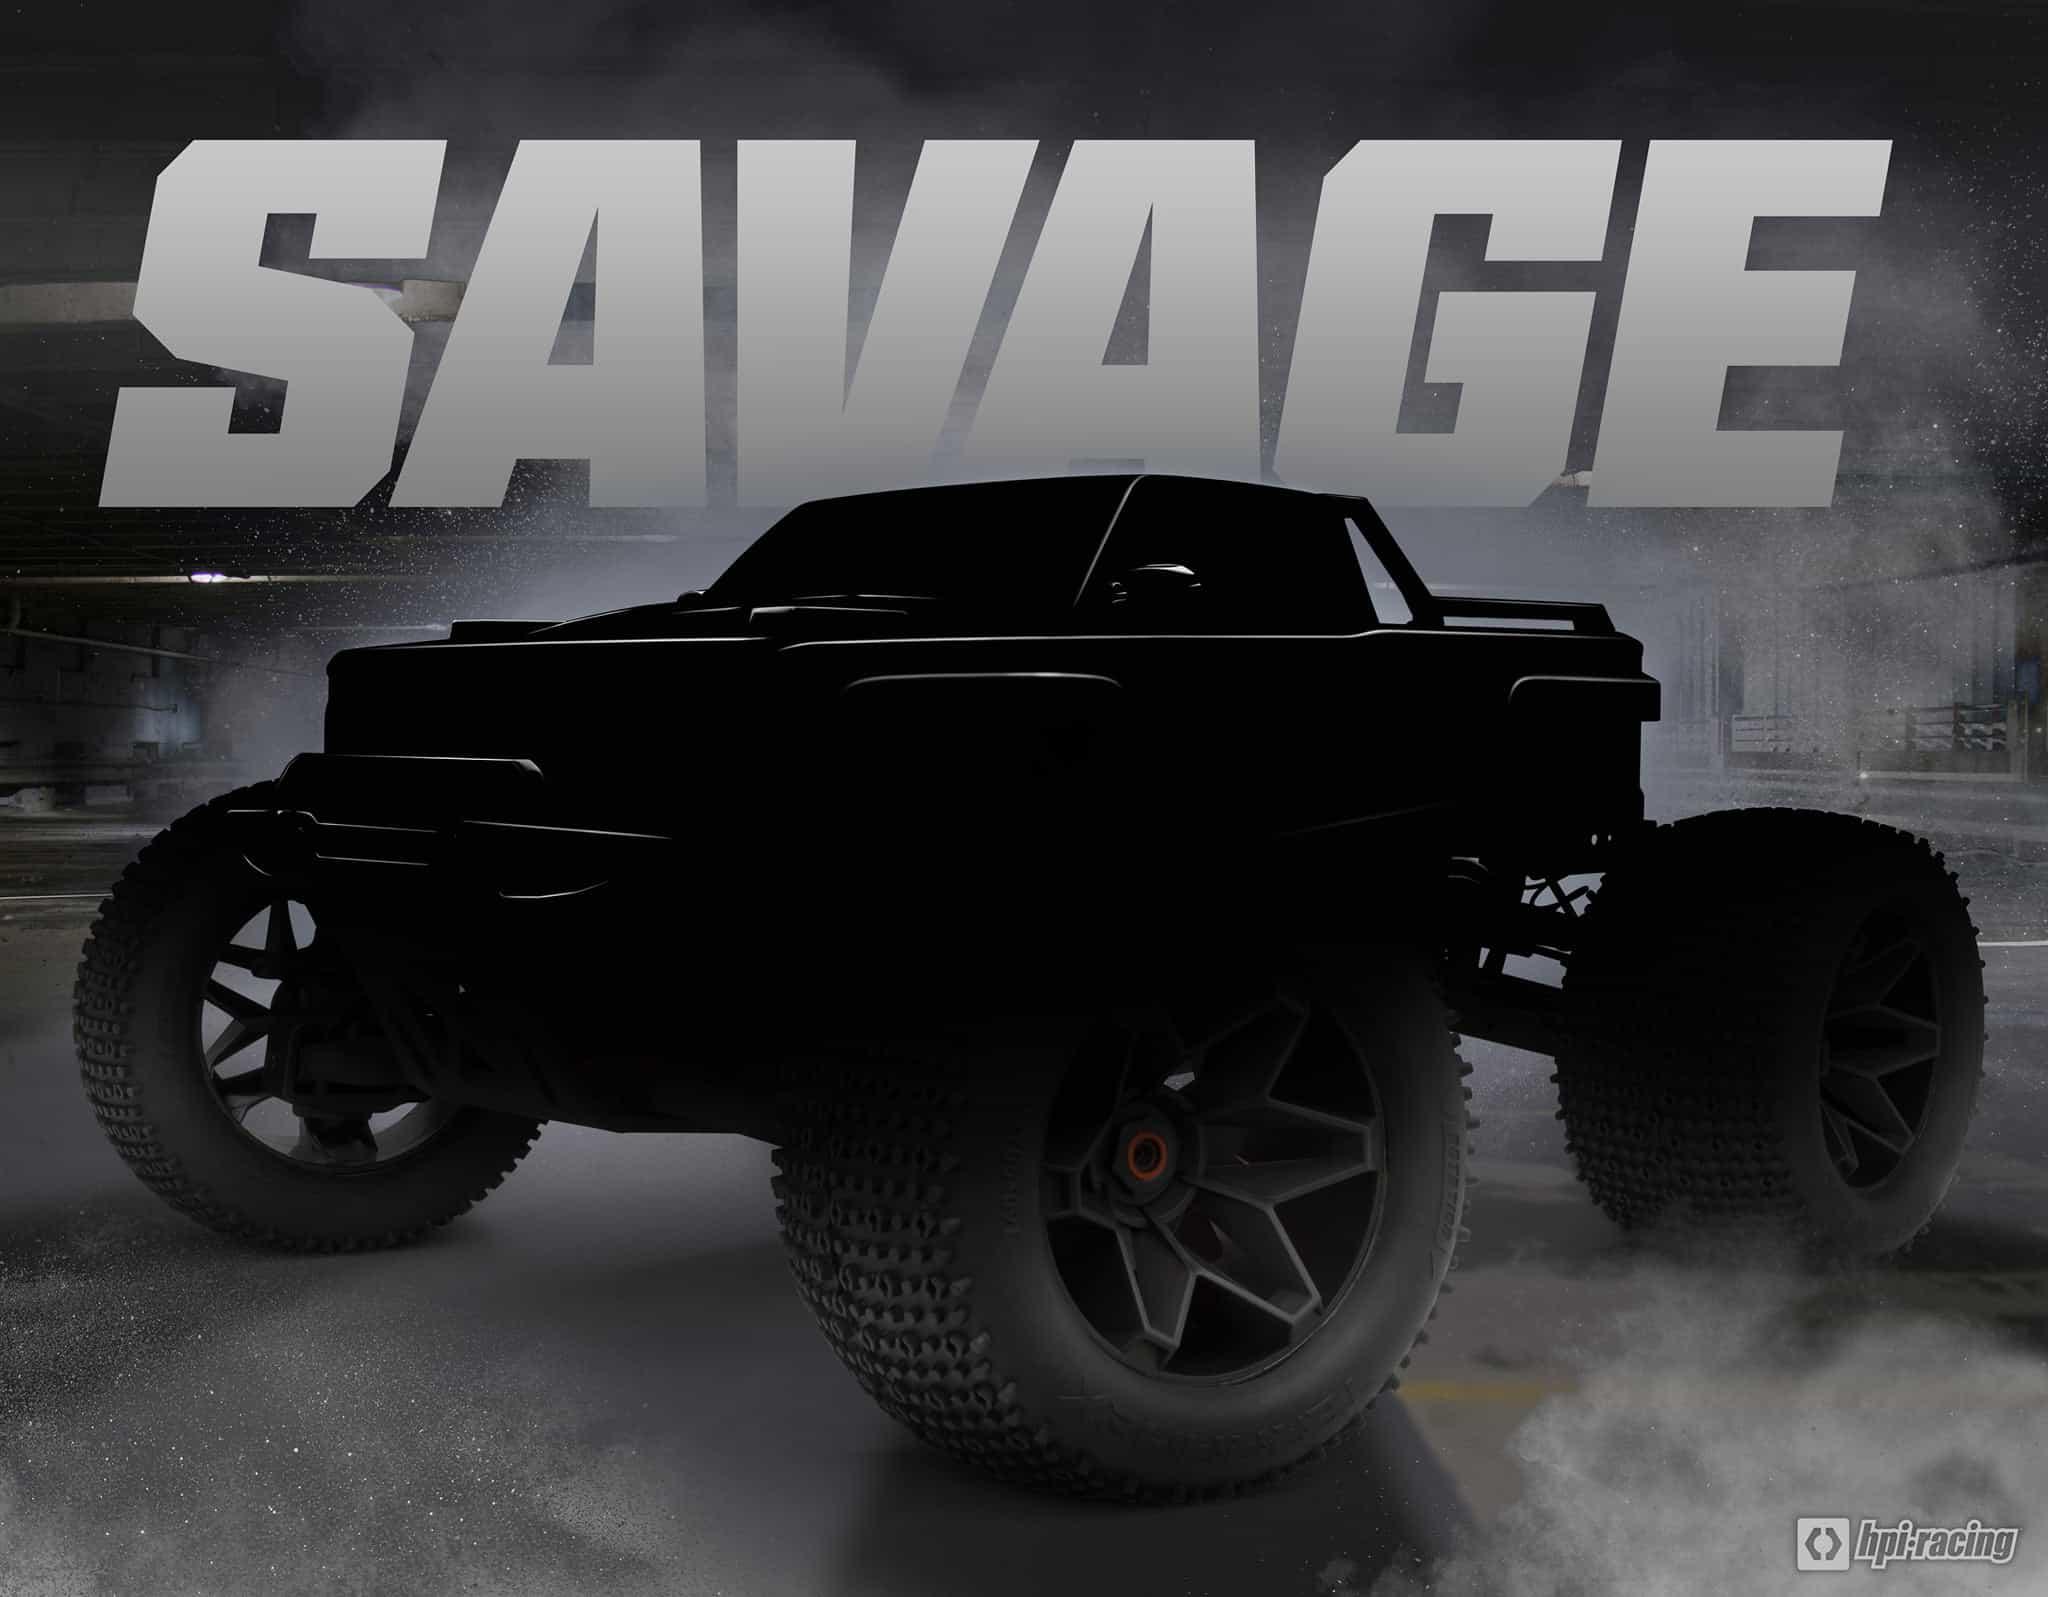 The king is returning… HPI is bringing back the HPI Savage